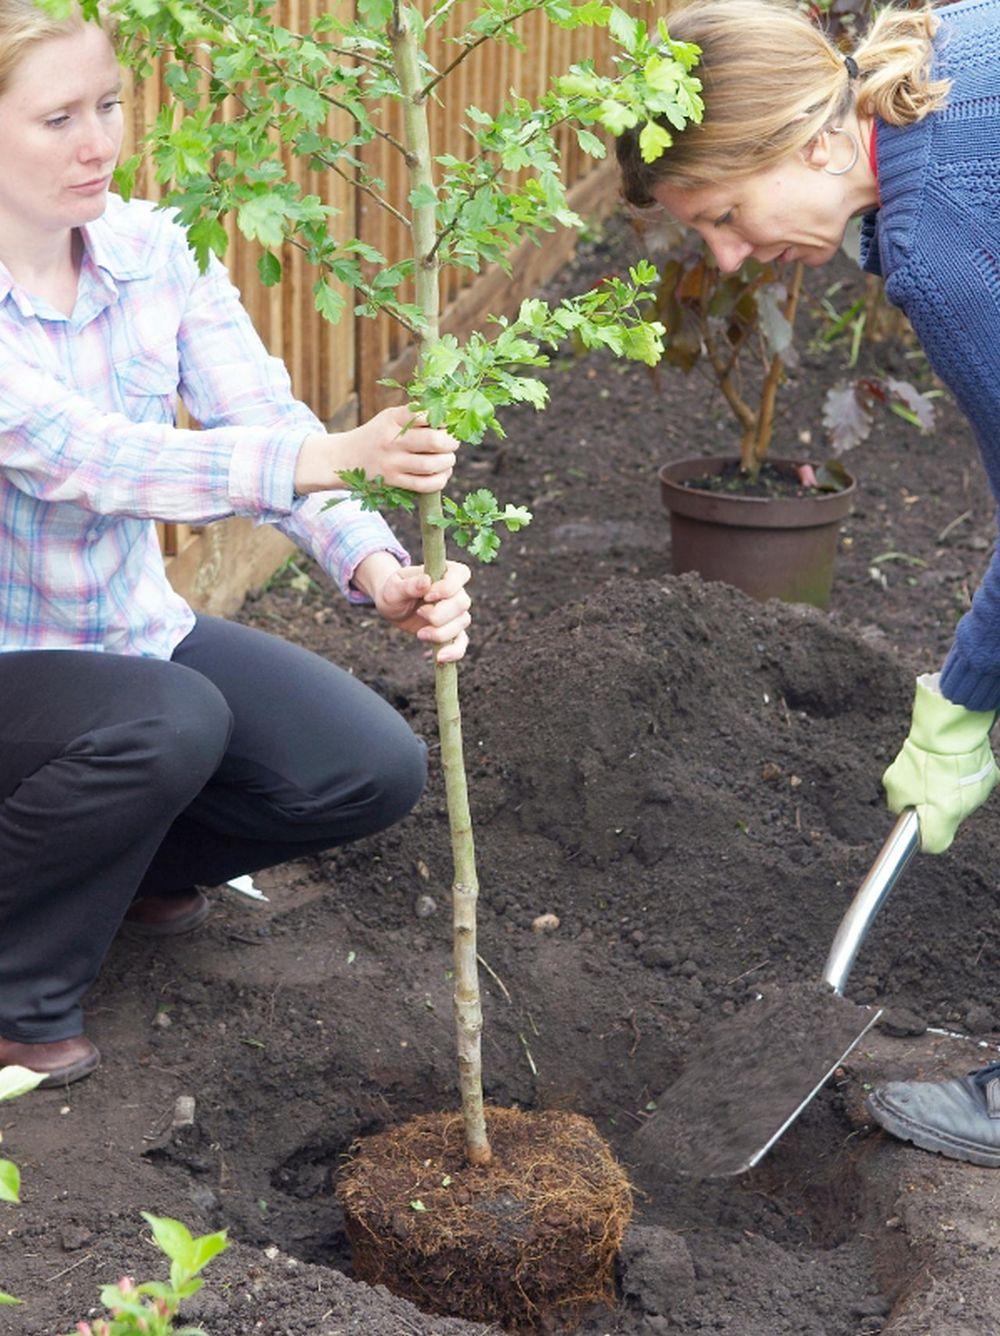 adelaparvu-com-despre-plantarea-copacilor-si-pomilor-in-gradina-text-carli-marian-7